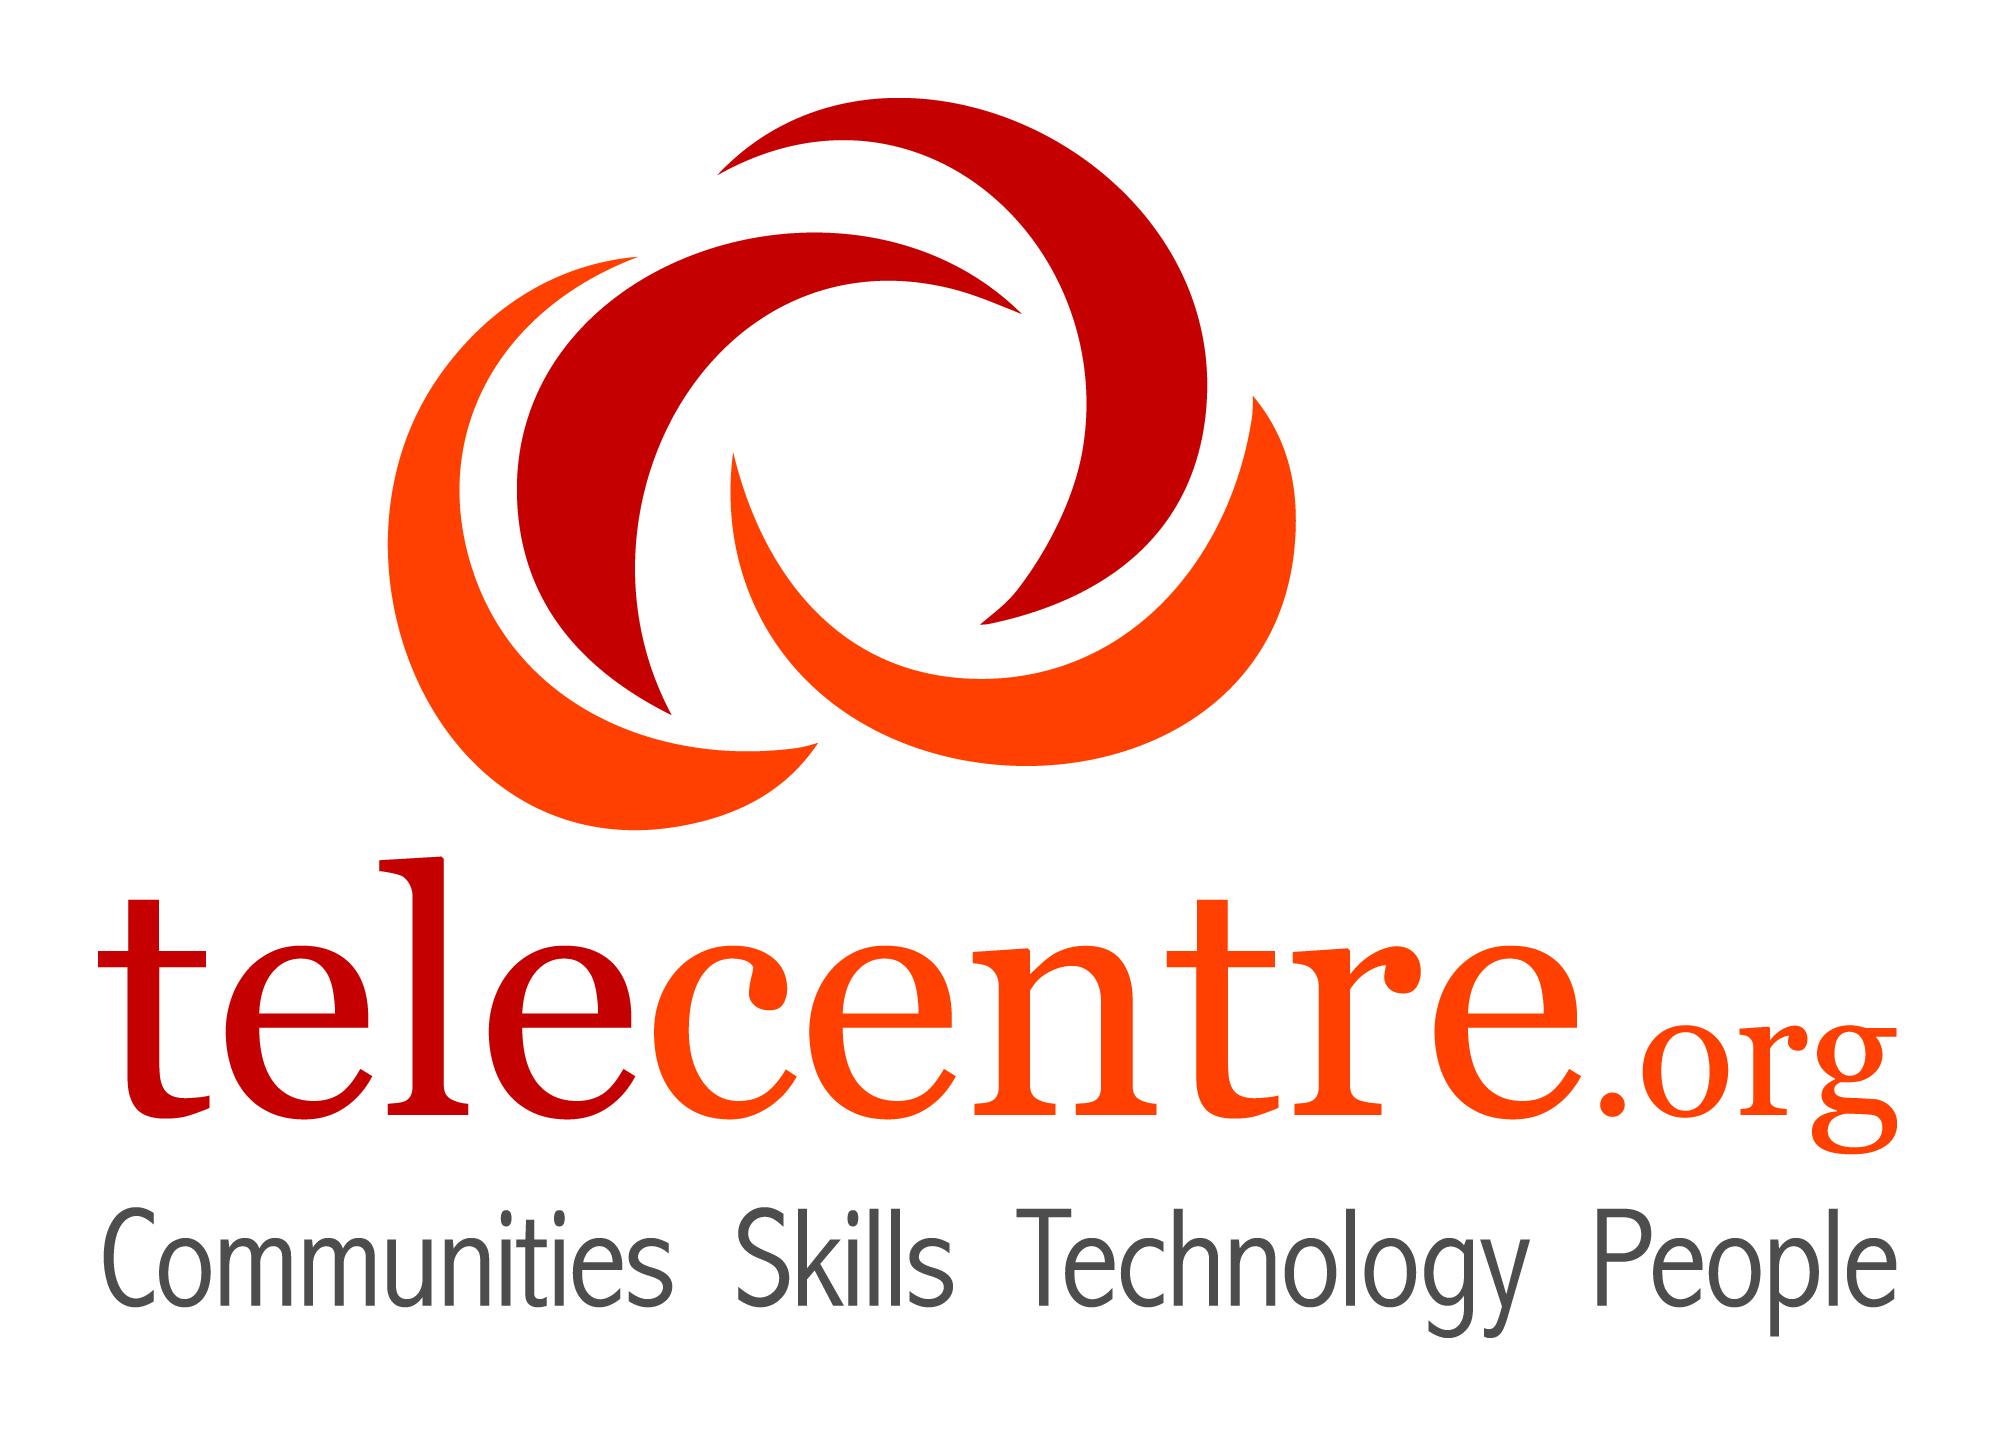 Telecentre.org